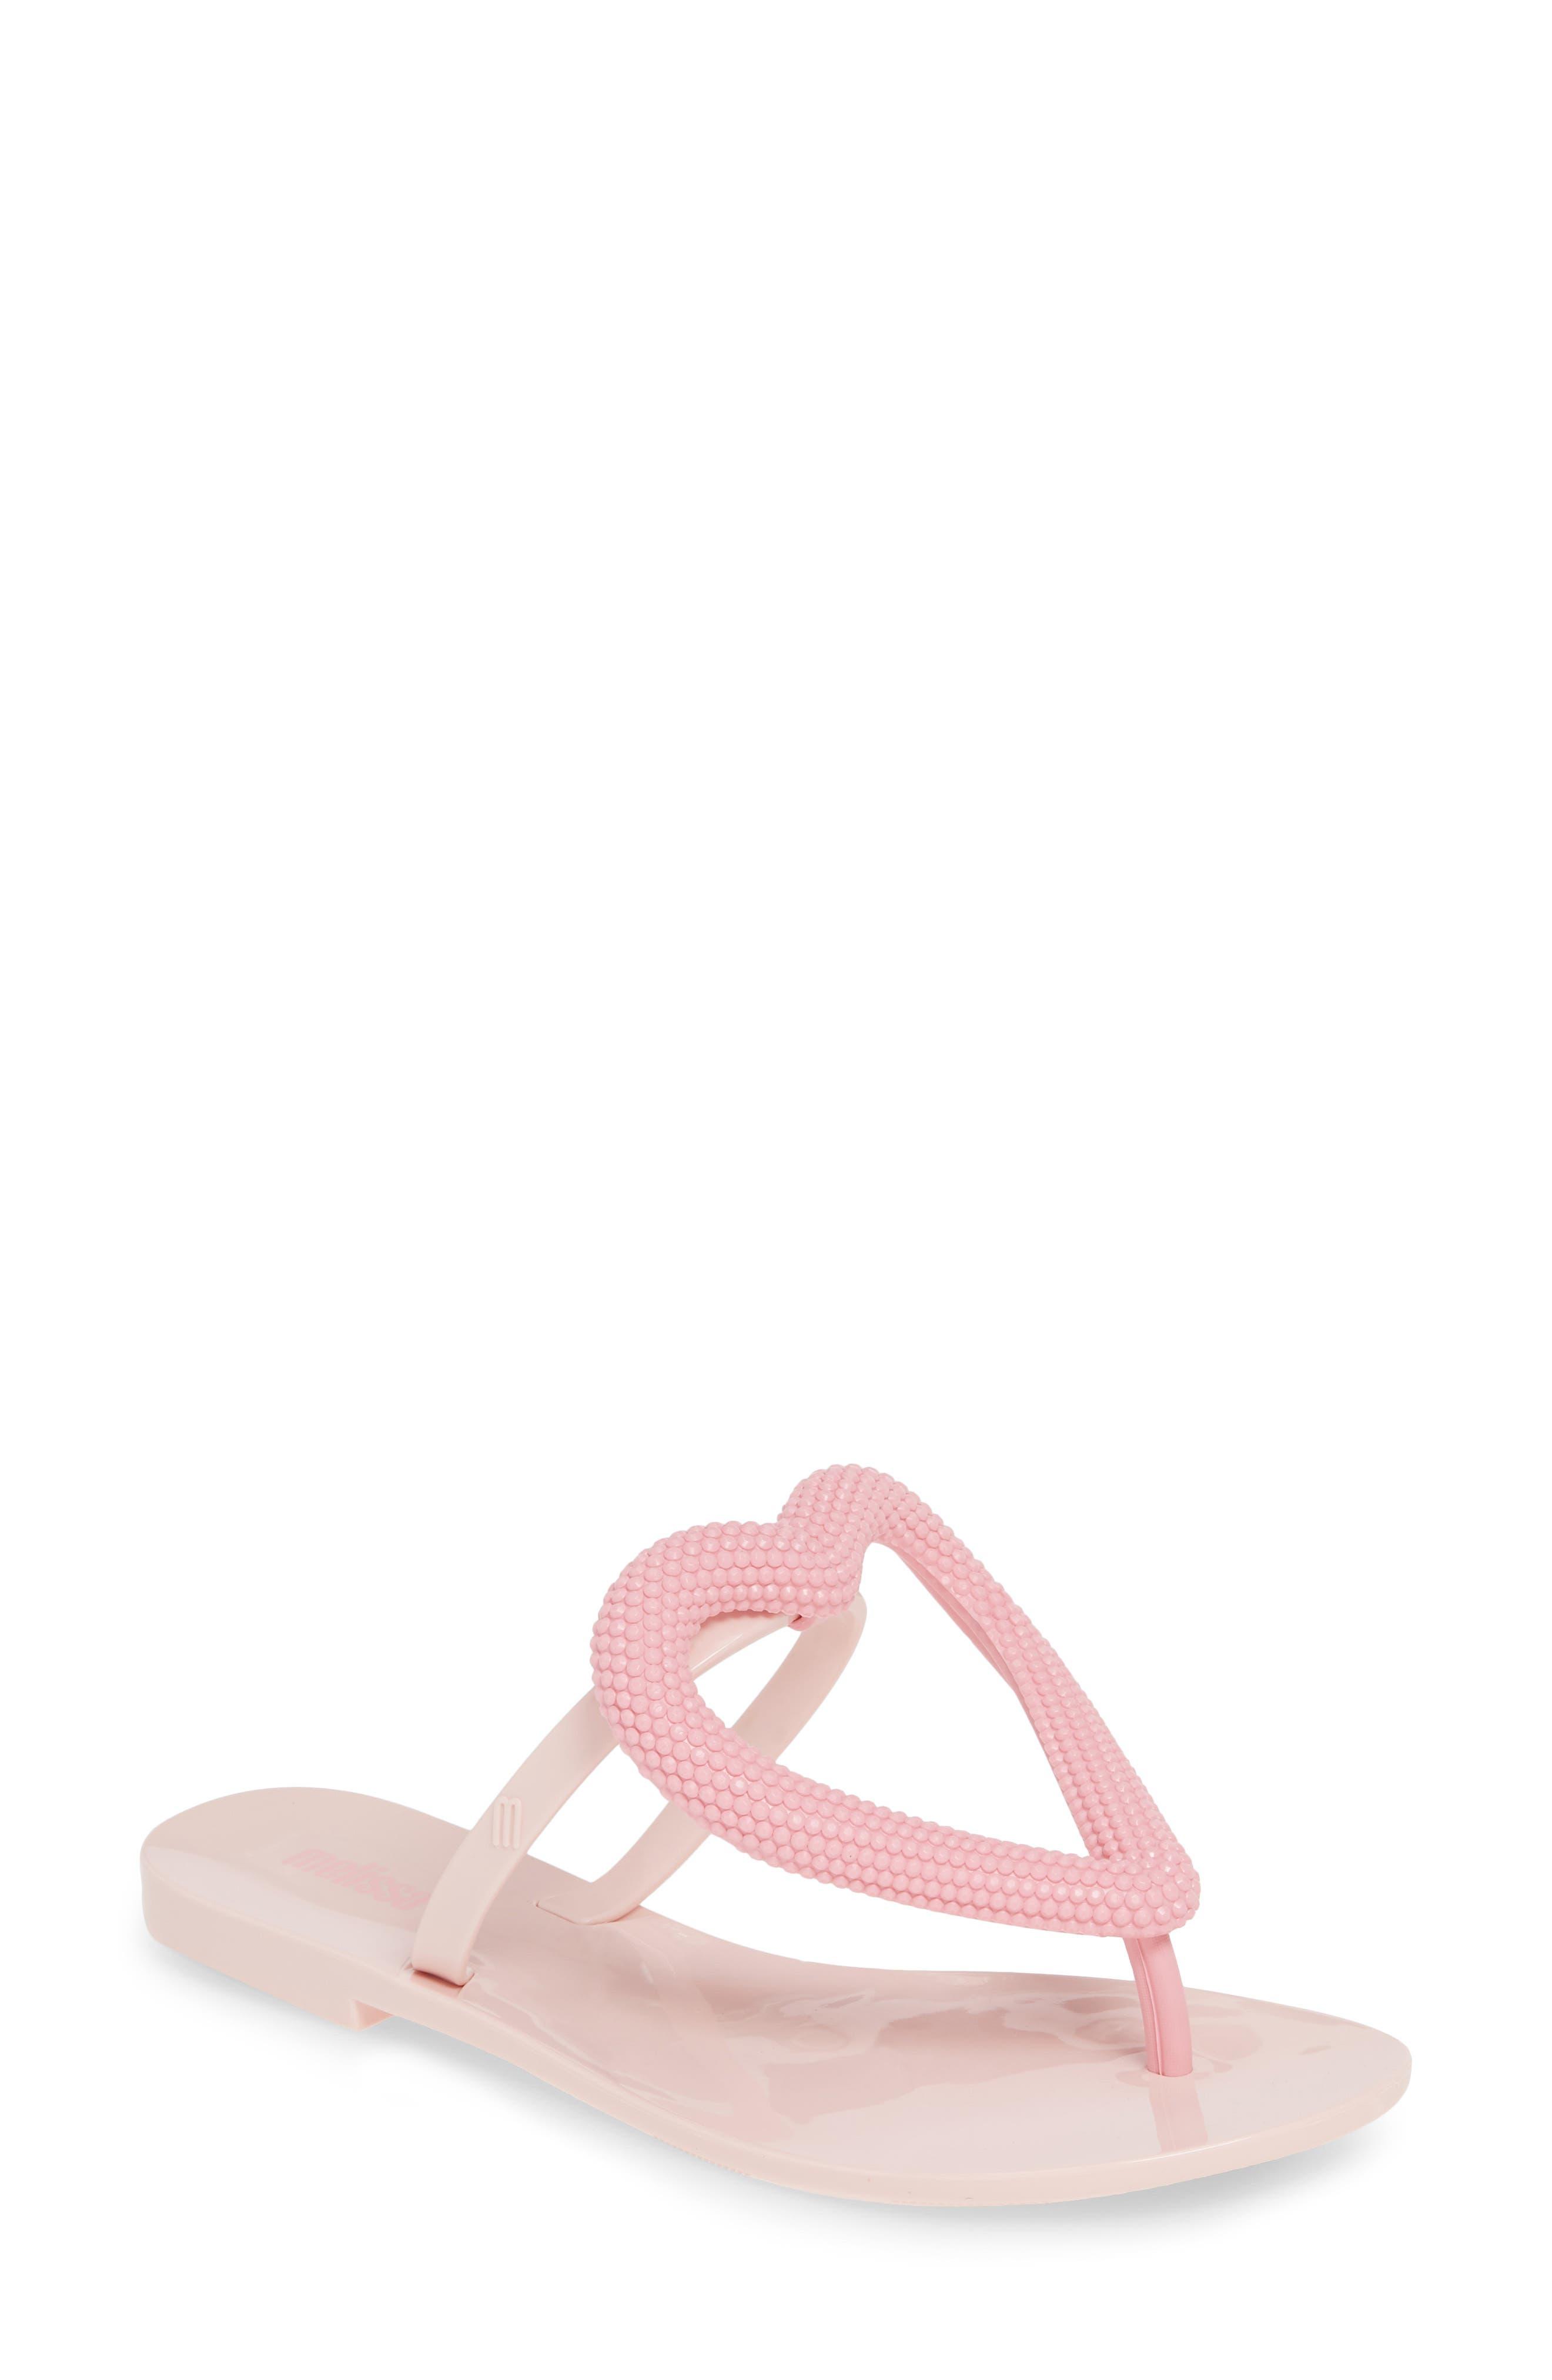 Melissa Big Heart Flip Flop, Pink